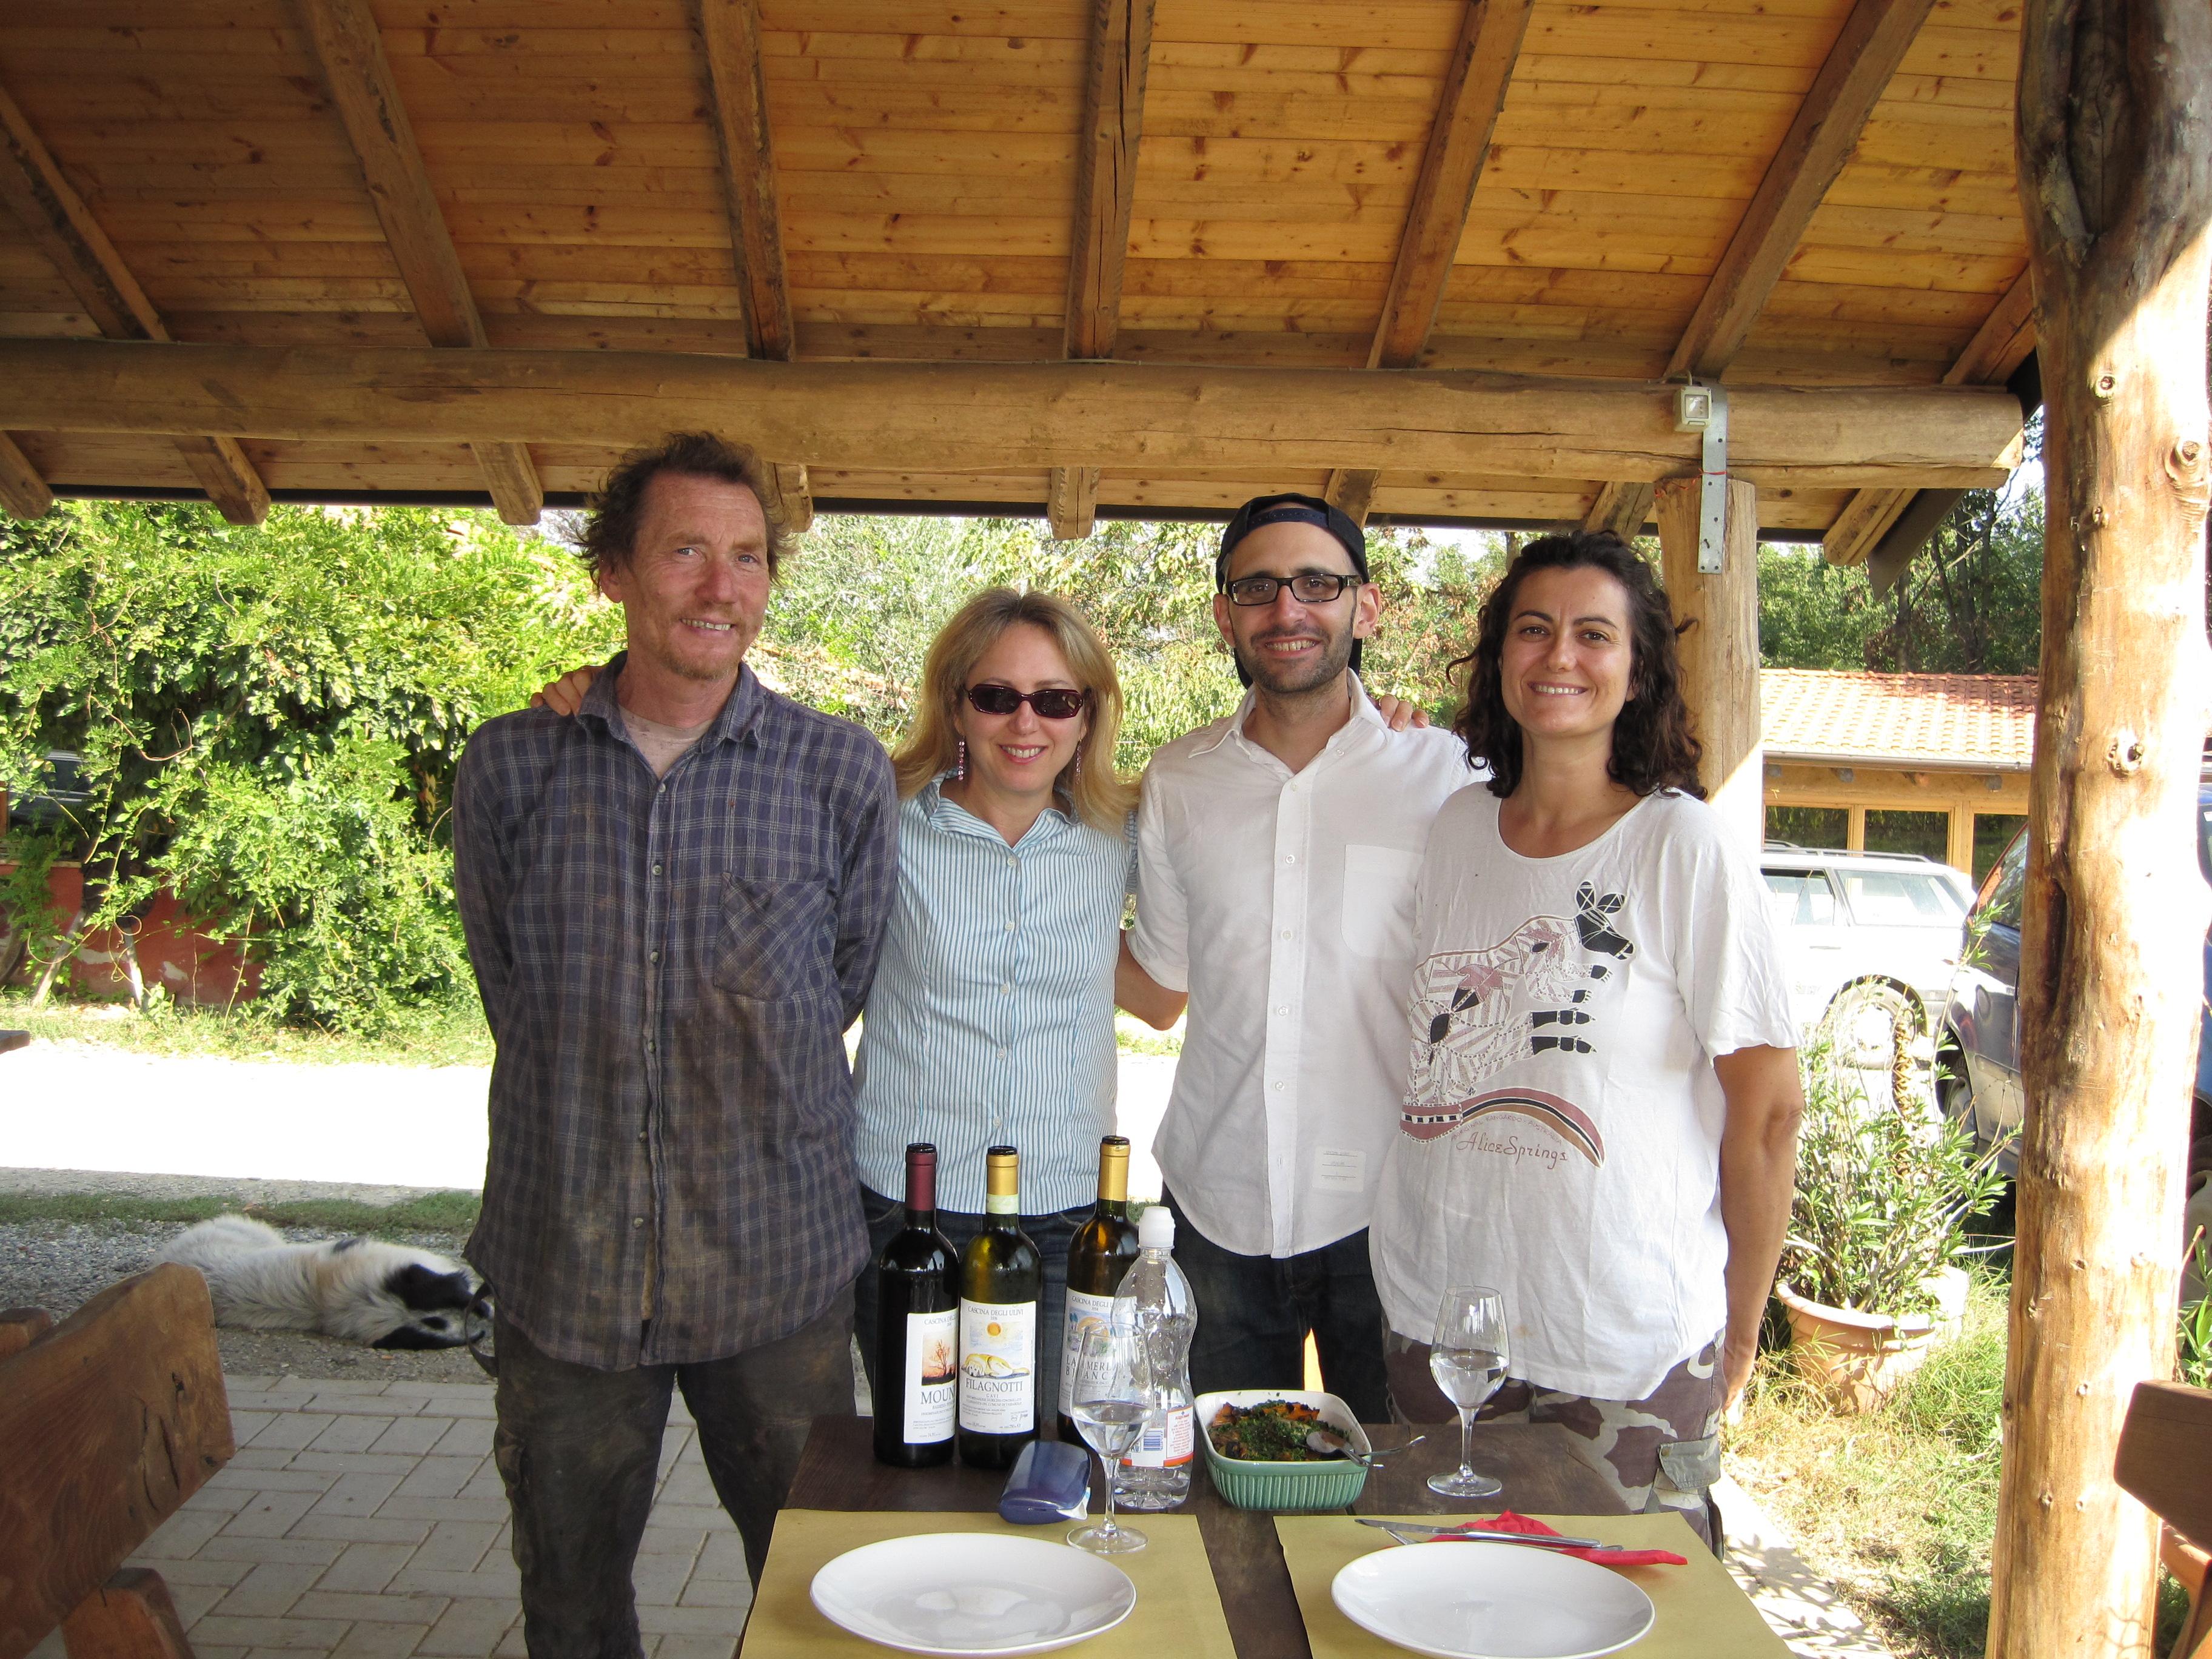 Bellotti is a well-known biodynamic wine maker